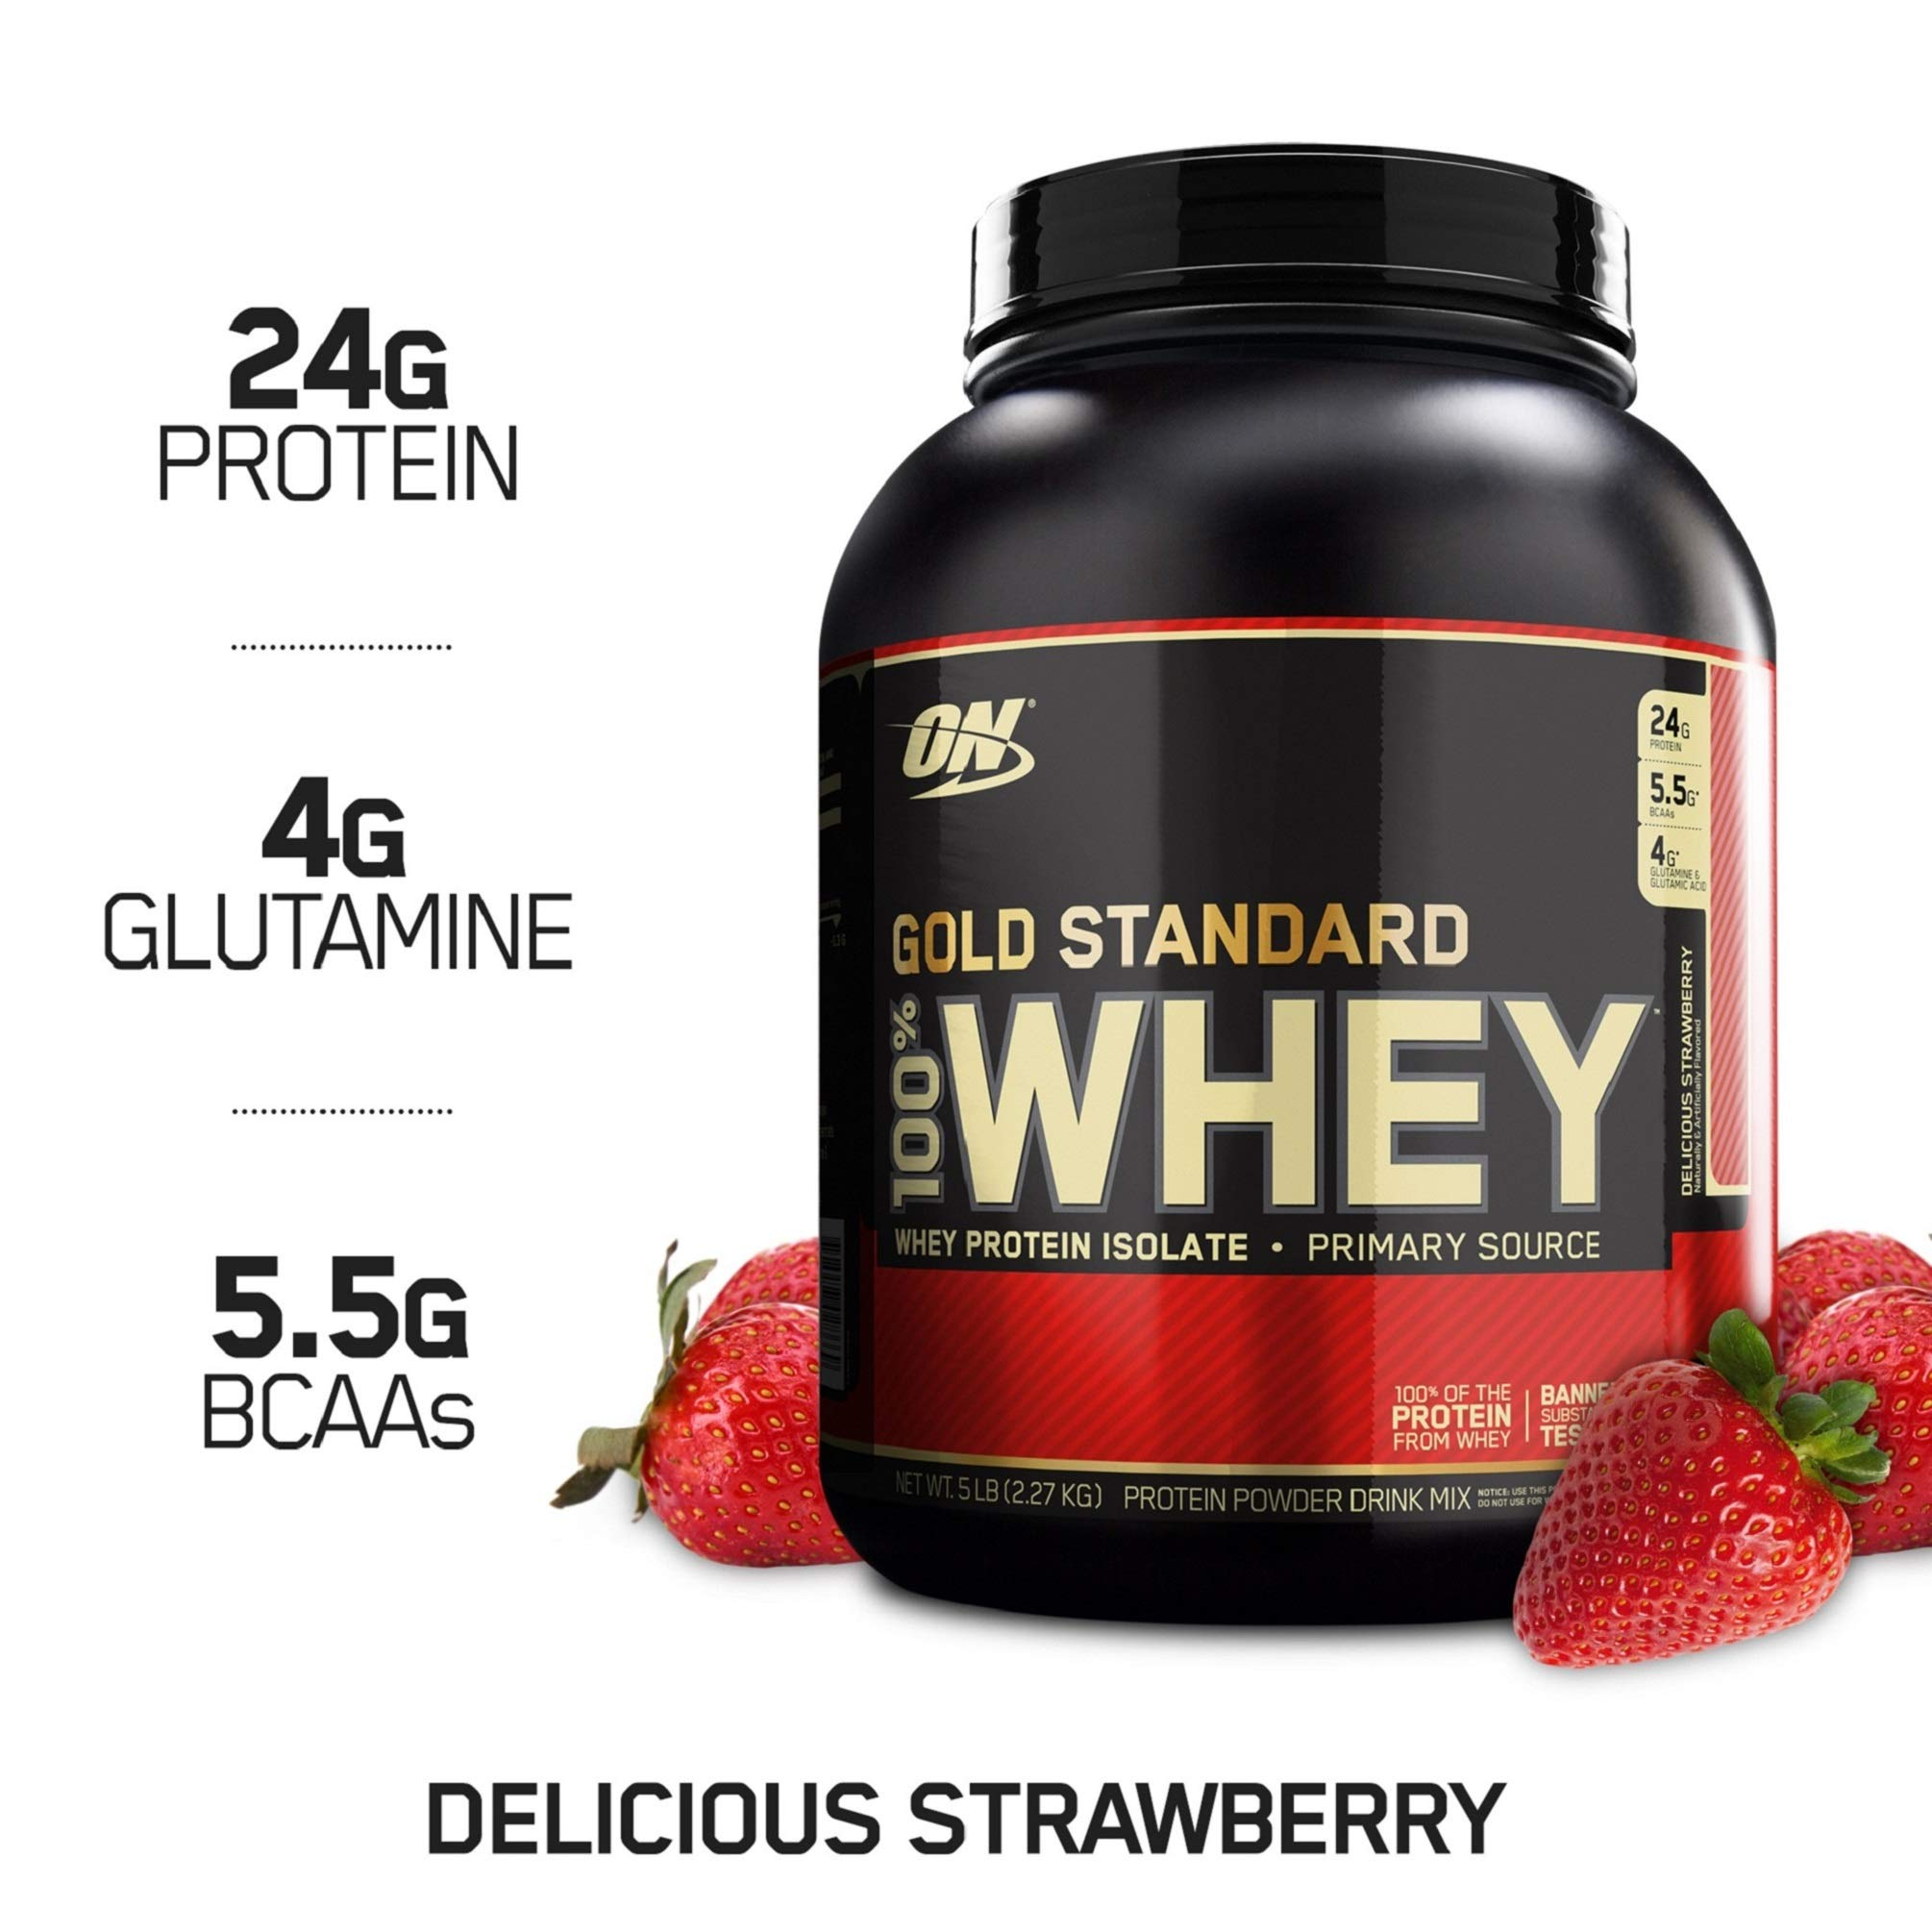 Optimum Nutrition Gold Standard 100% Whey Protein Powder, Delicious Strawberry, 5 Pound by Optimum Nutrition